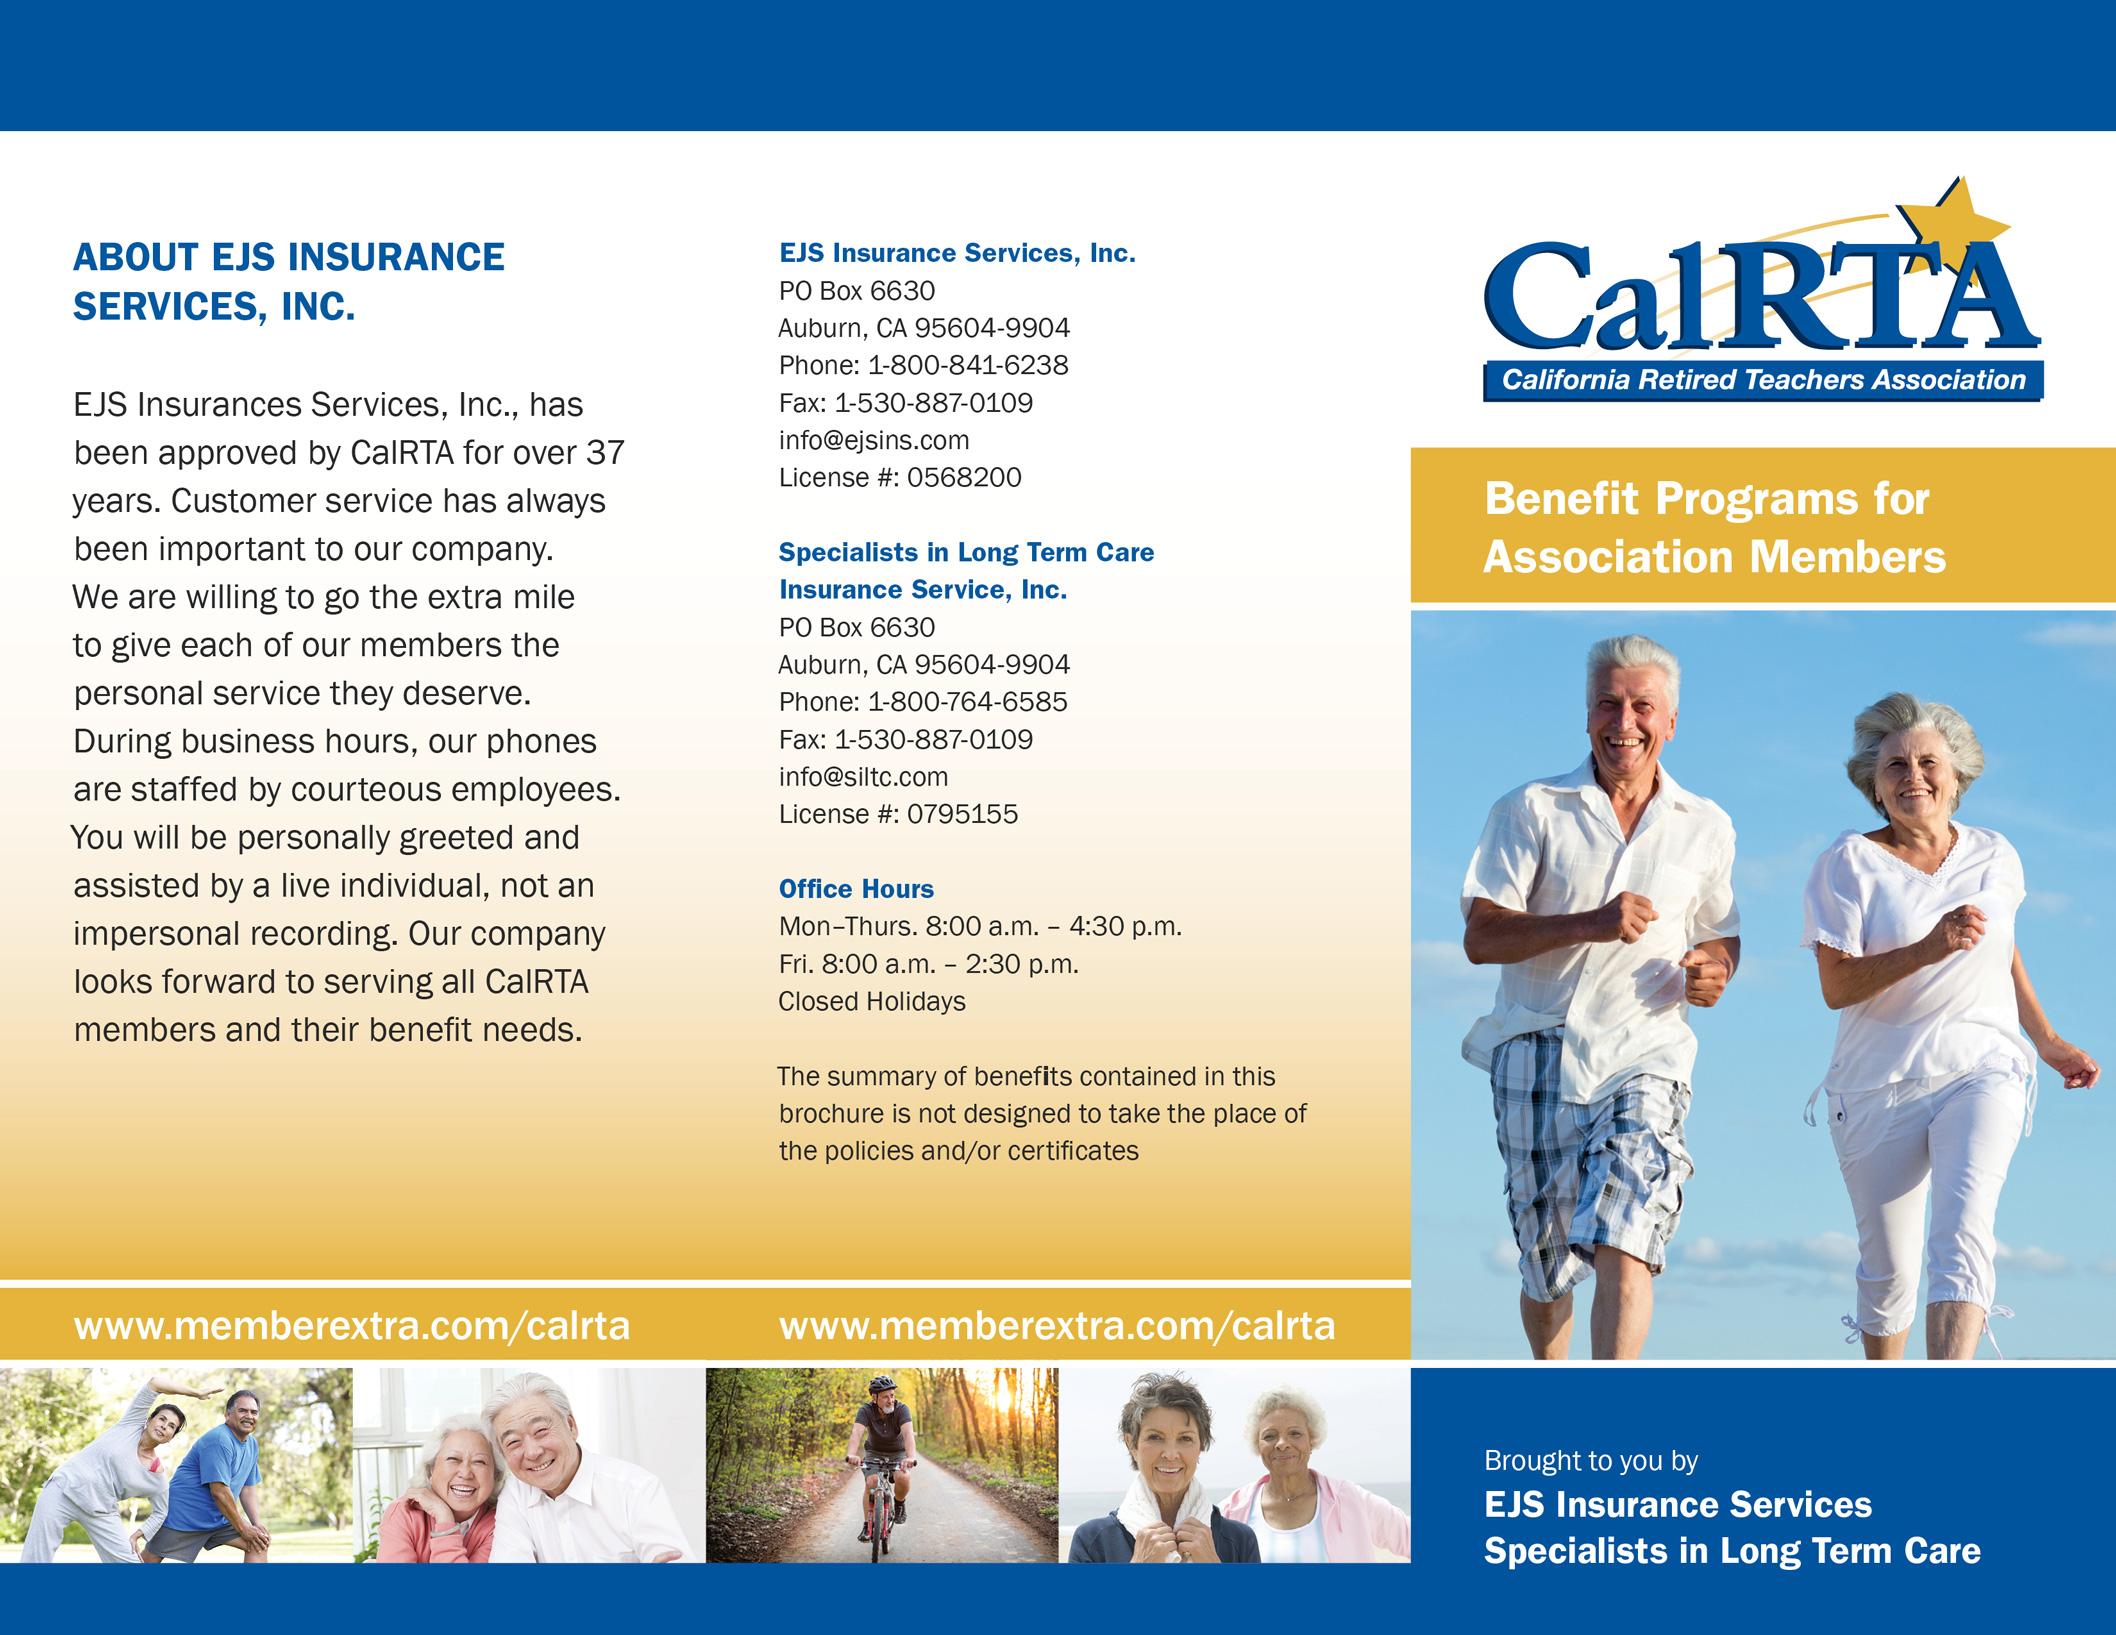 Brochure for insurance company.